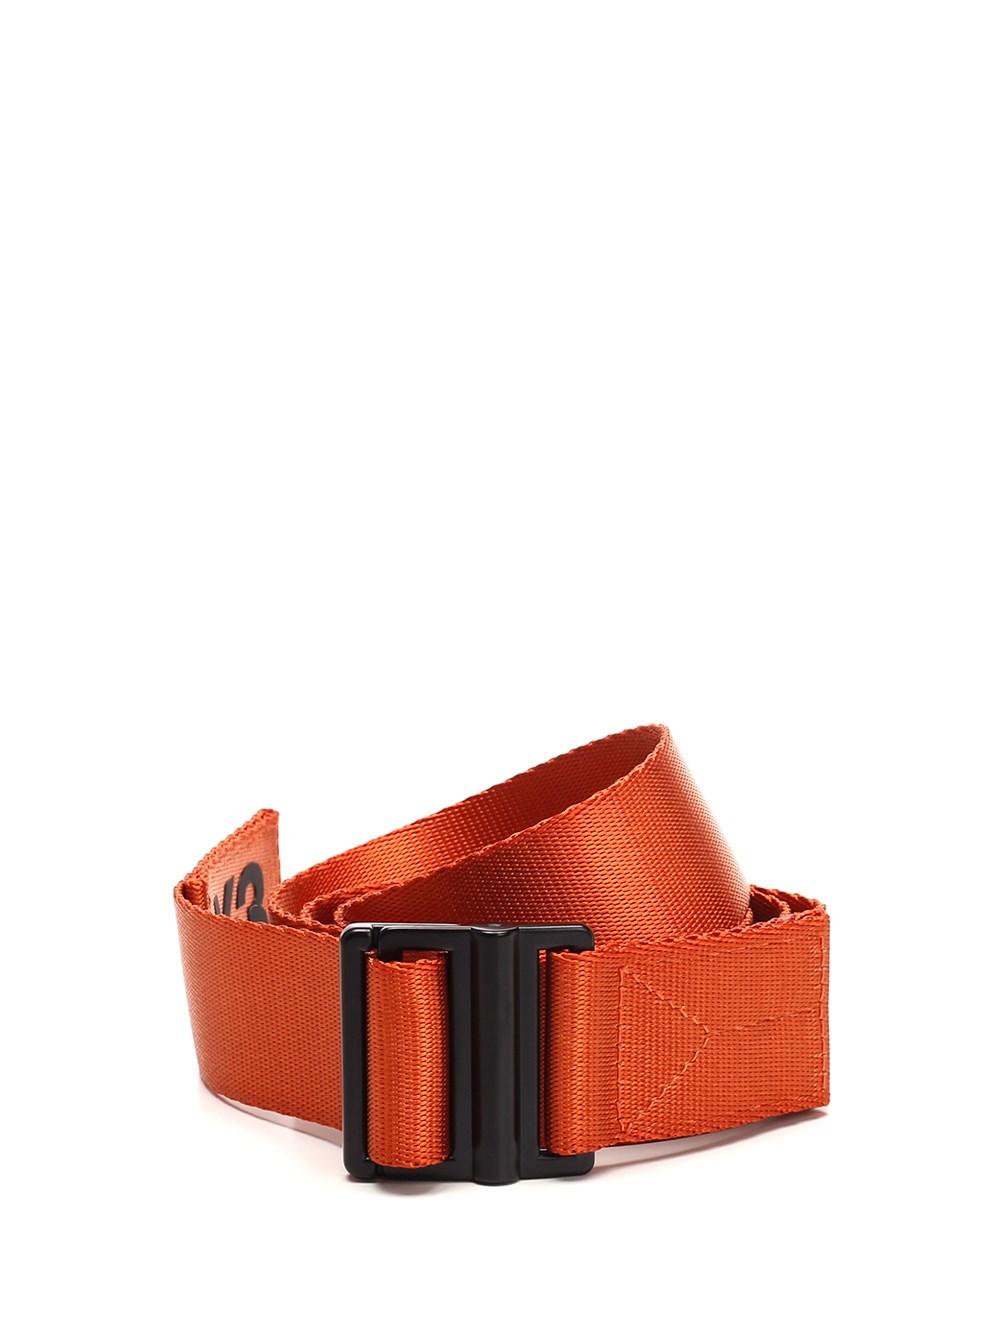 ADIDAS Y-3 Orange Belt